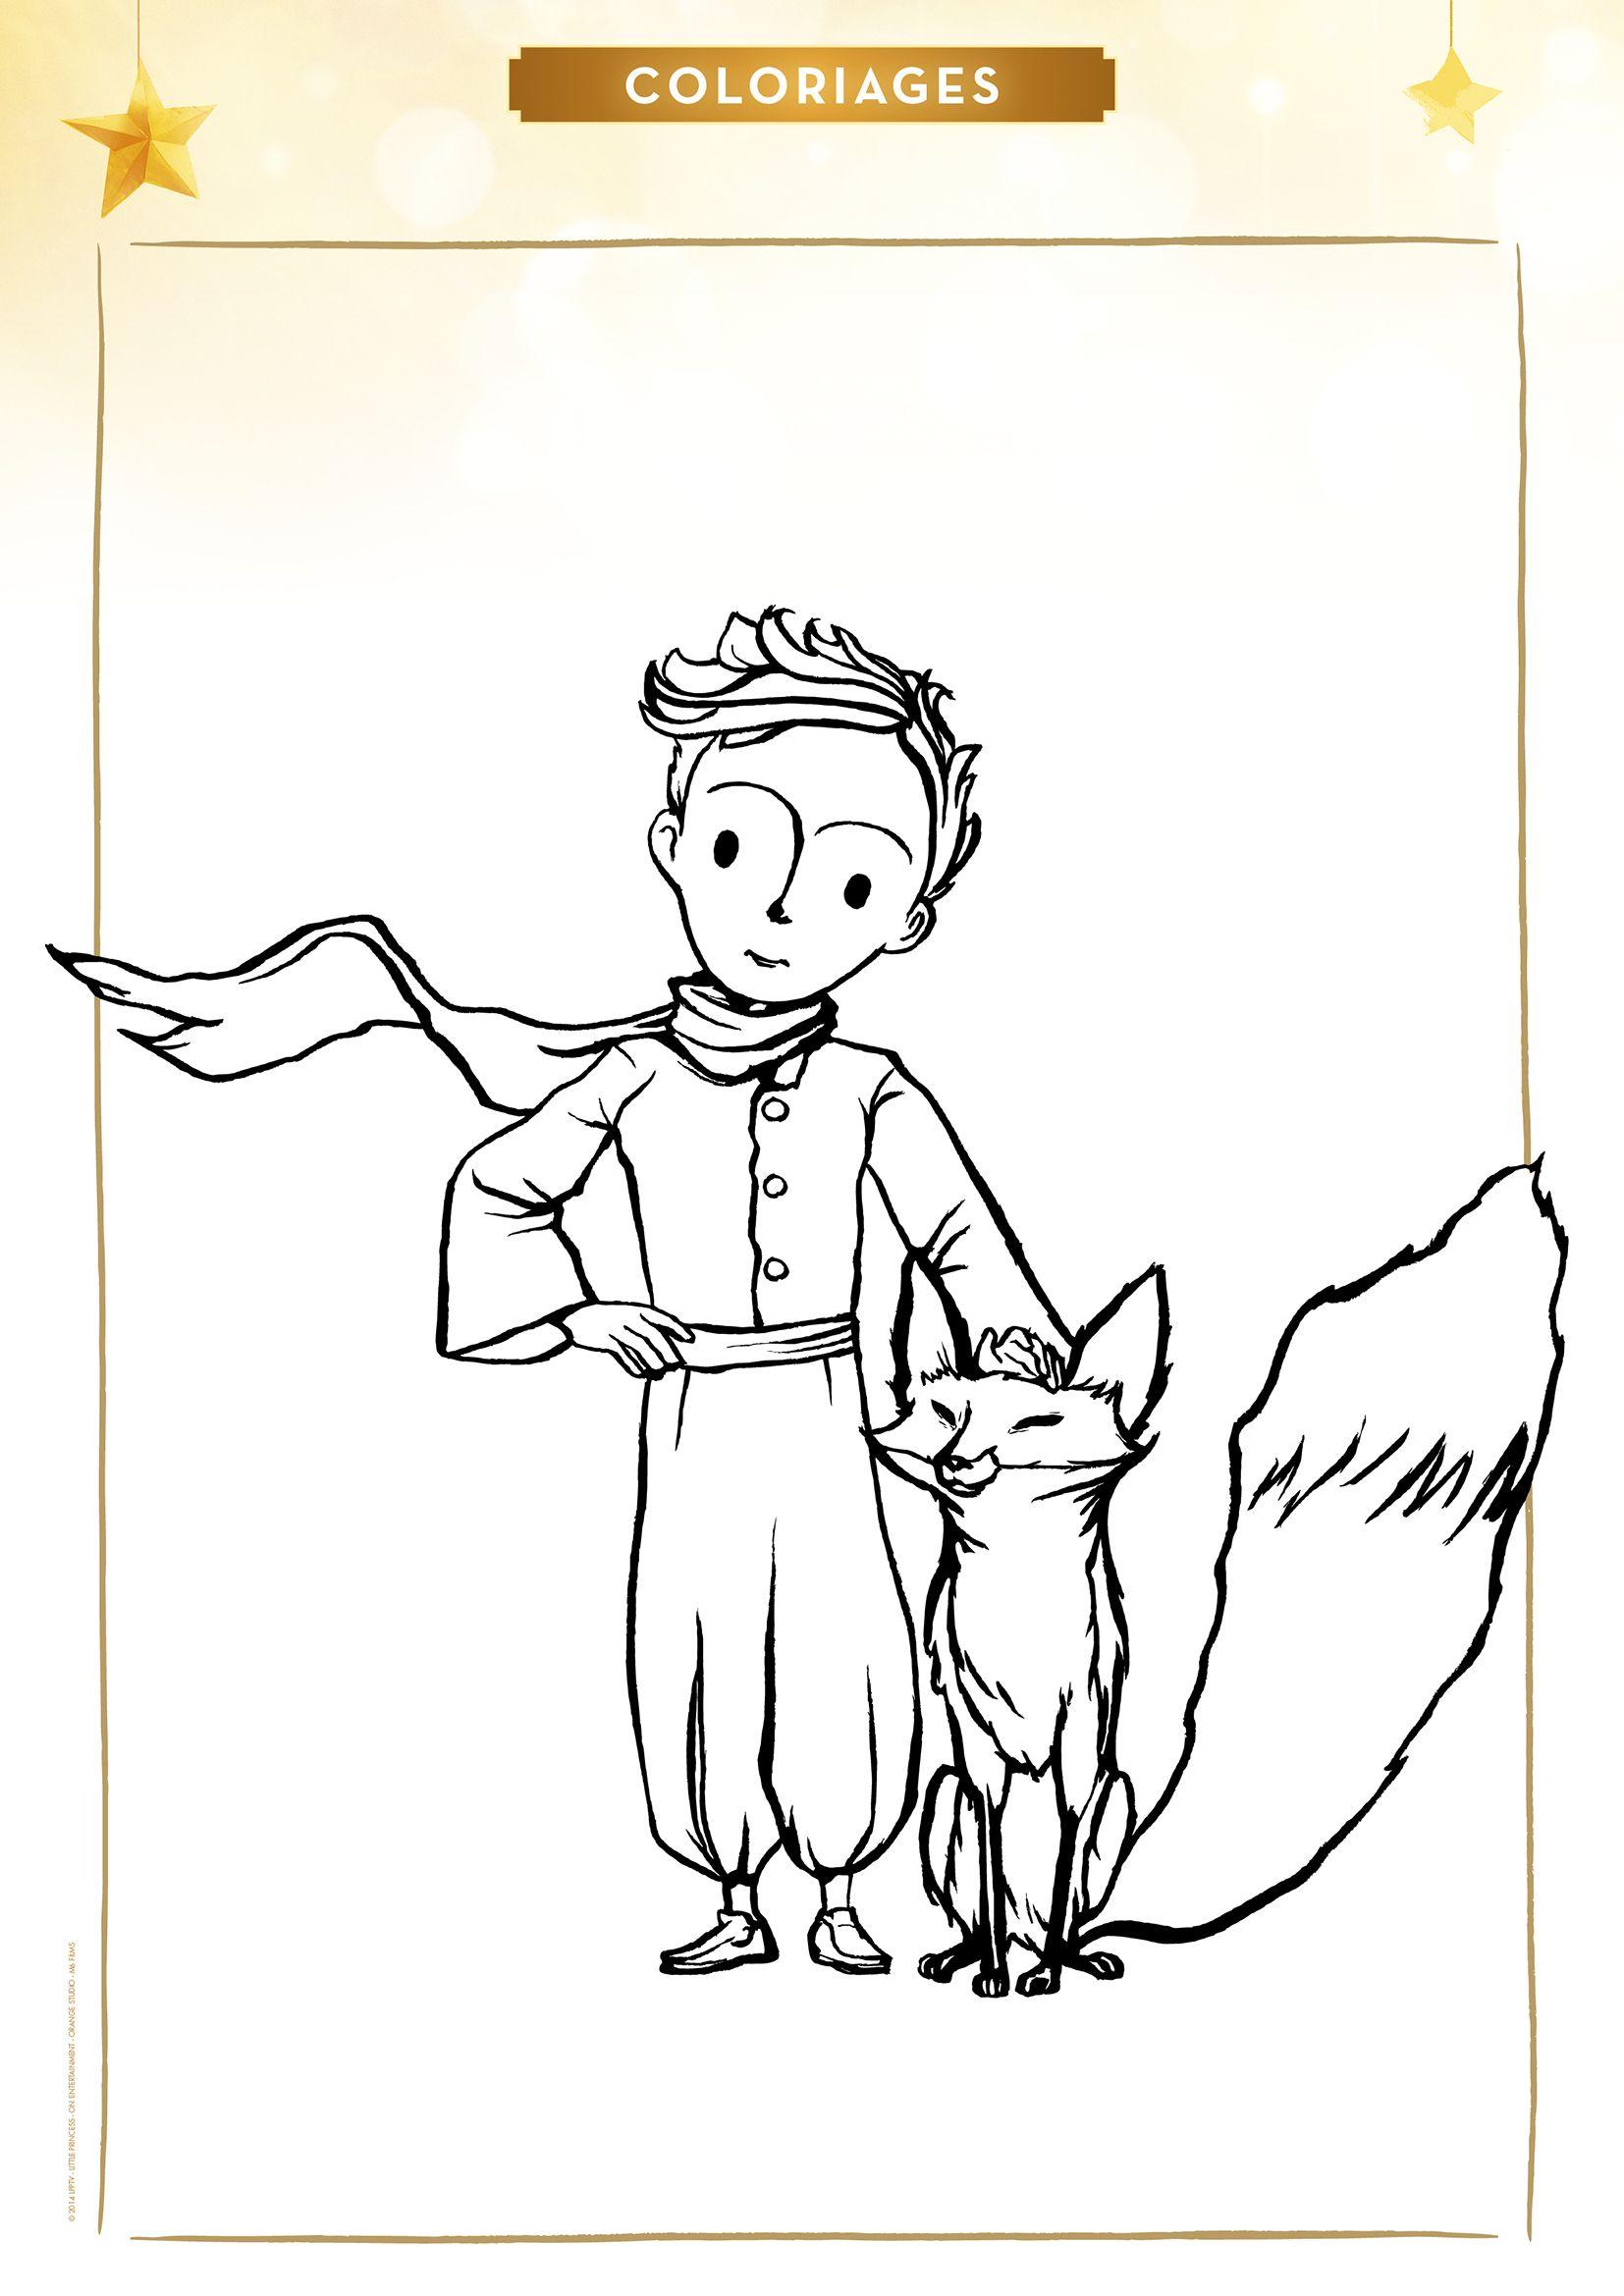 Coloriage le petit prince et le renard diy sketch - Dessin princesse ...